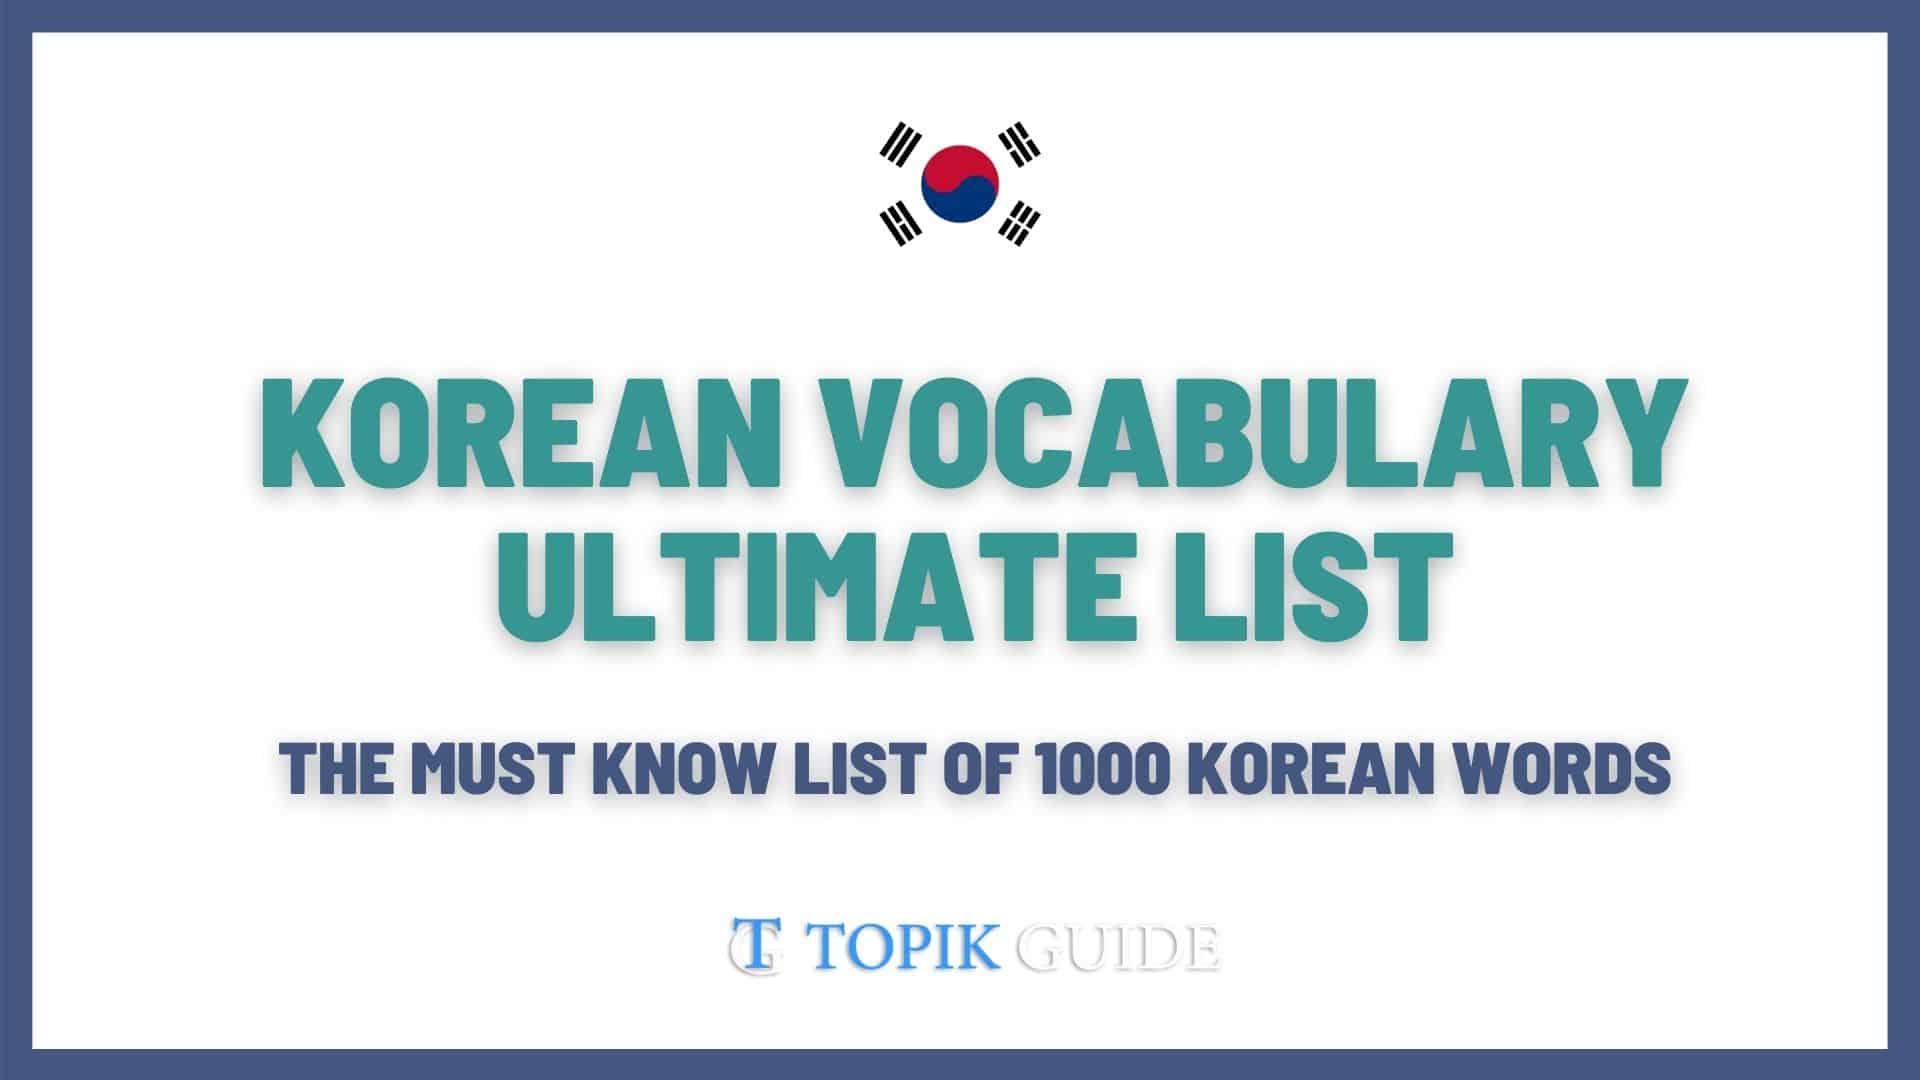 Korean Vocabulary Ultimate List TOPIK GUIDE